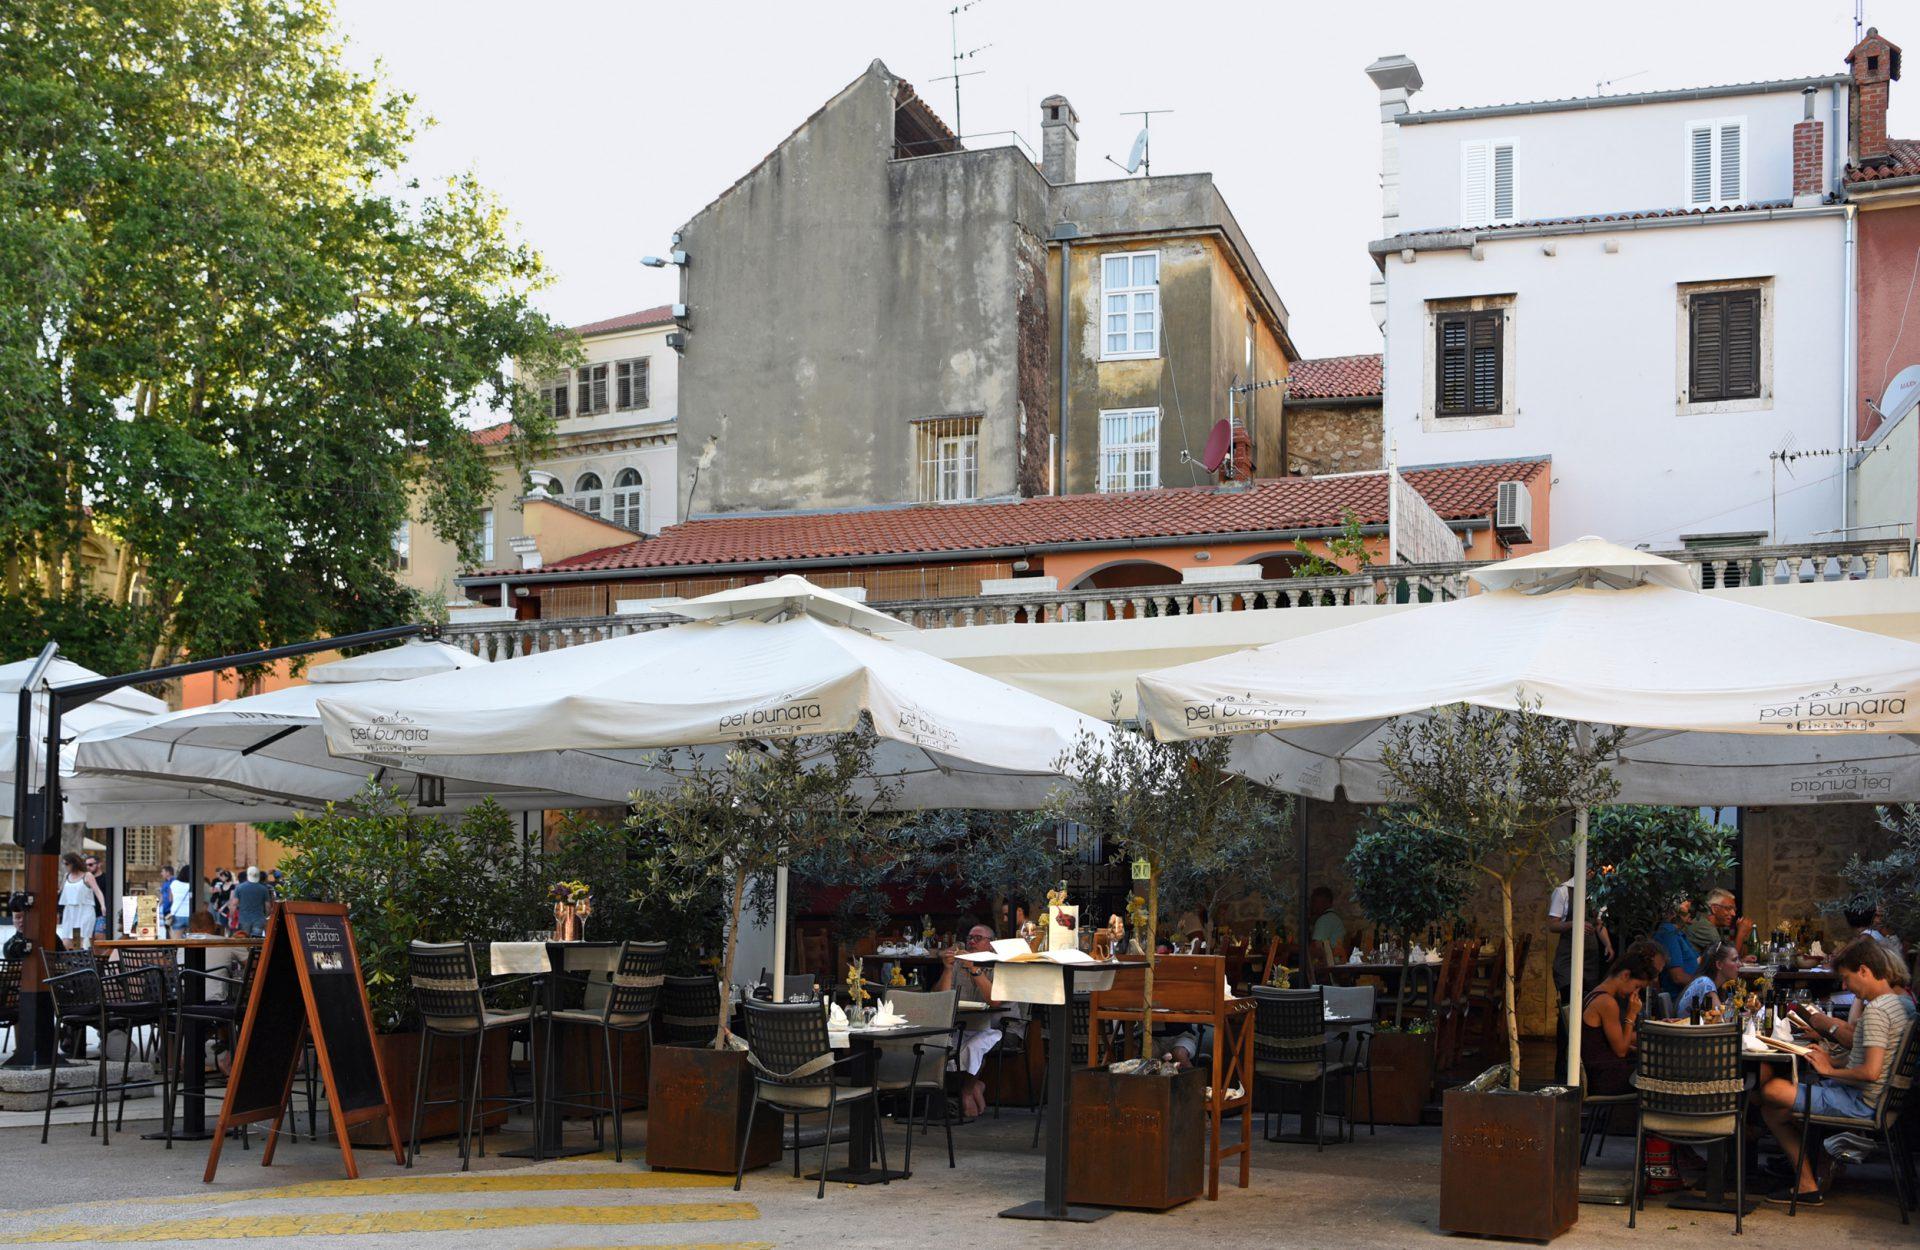 Zadar - Pet Bunara Restaurant